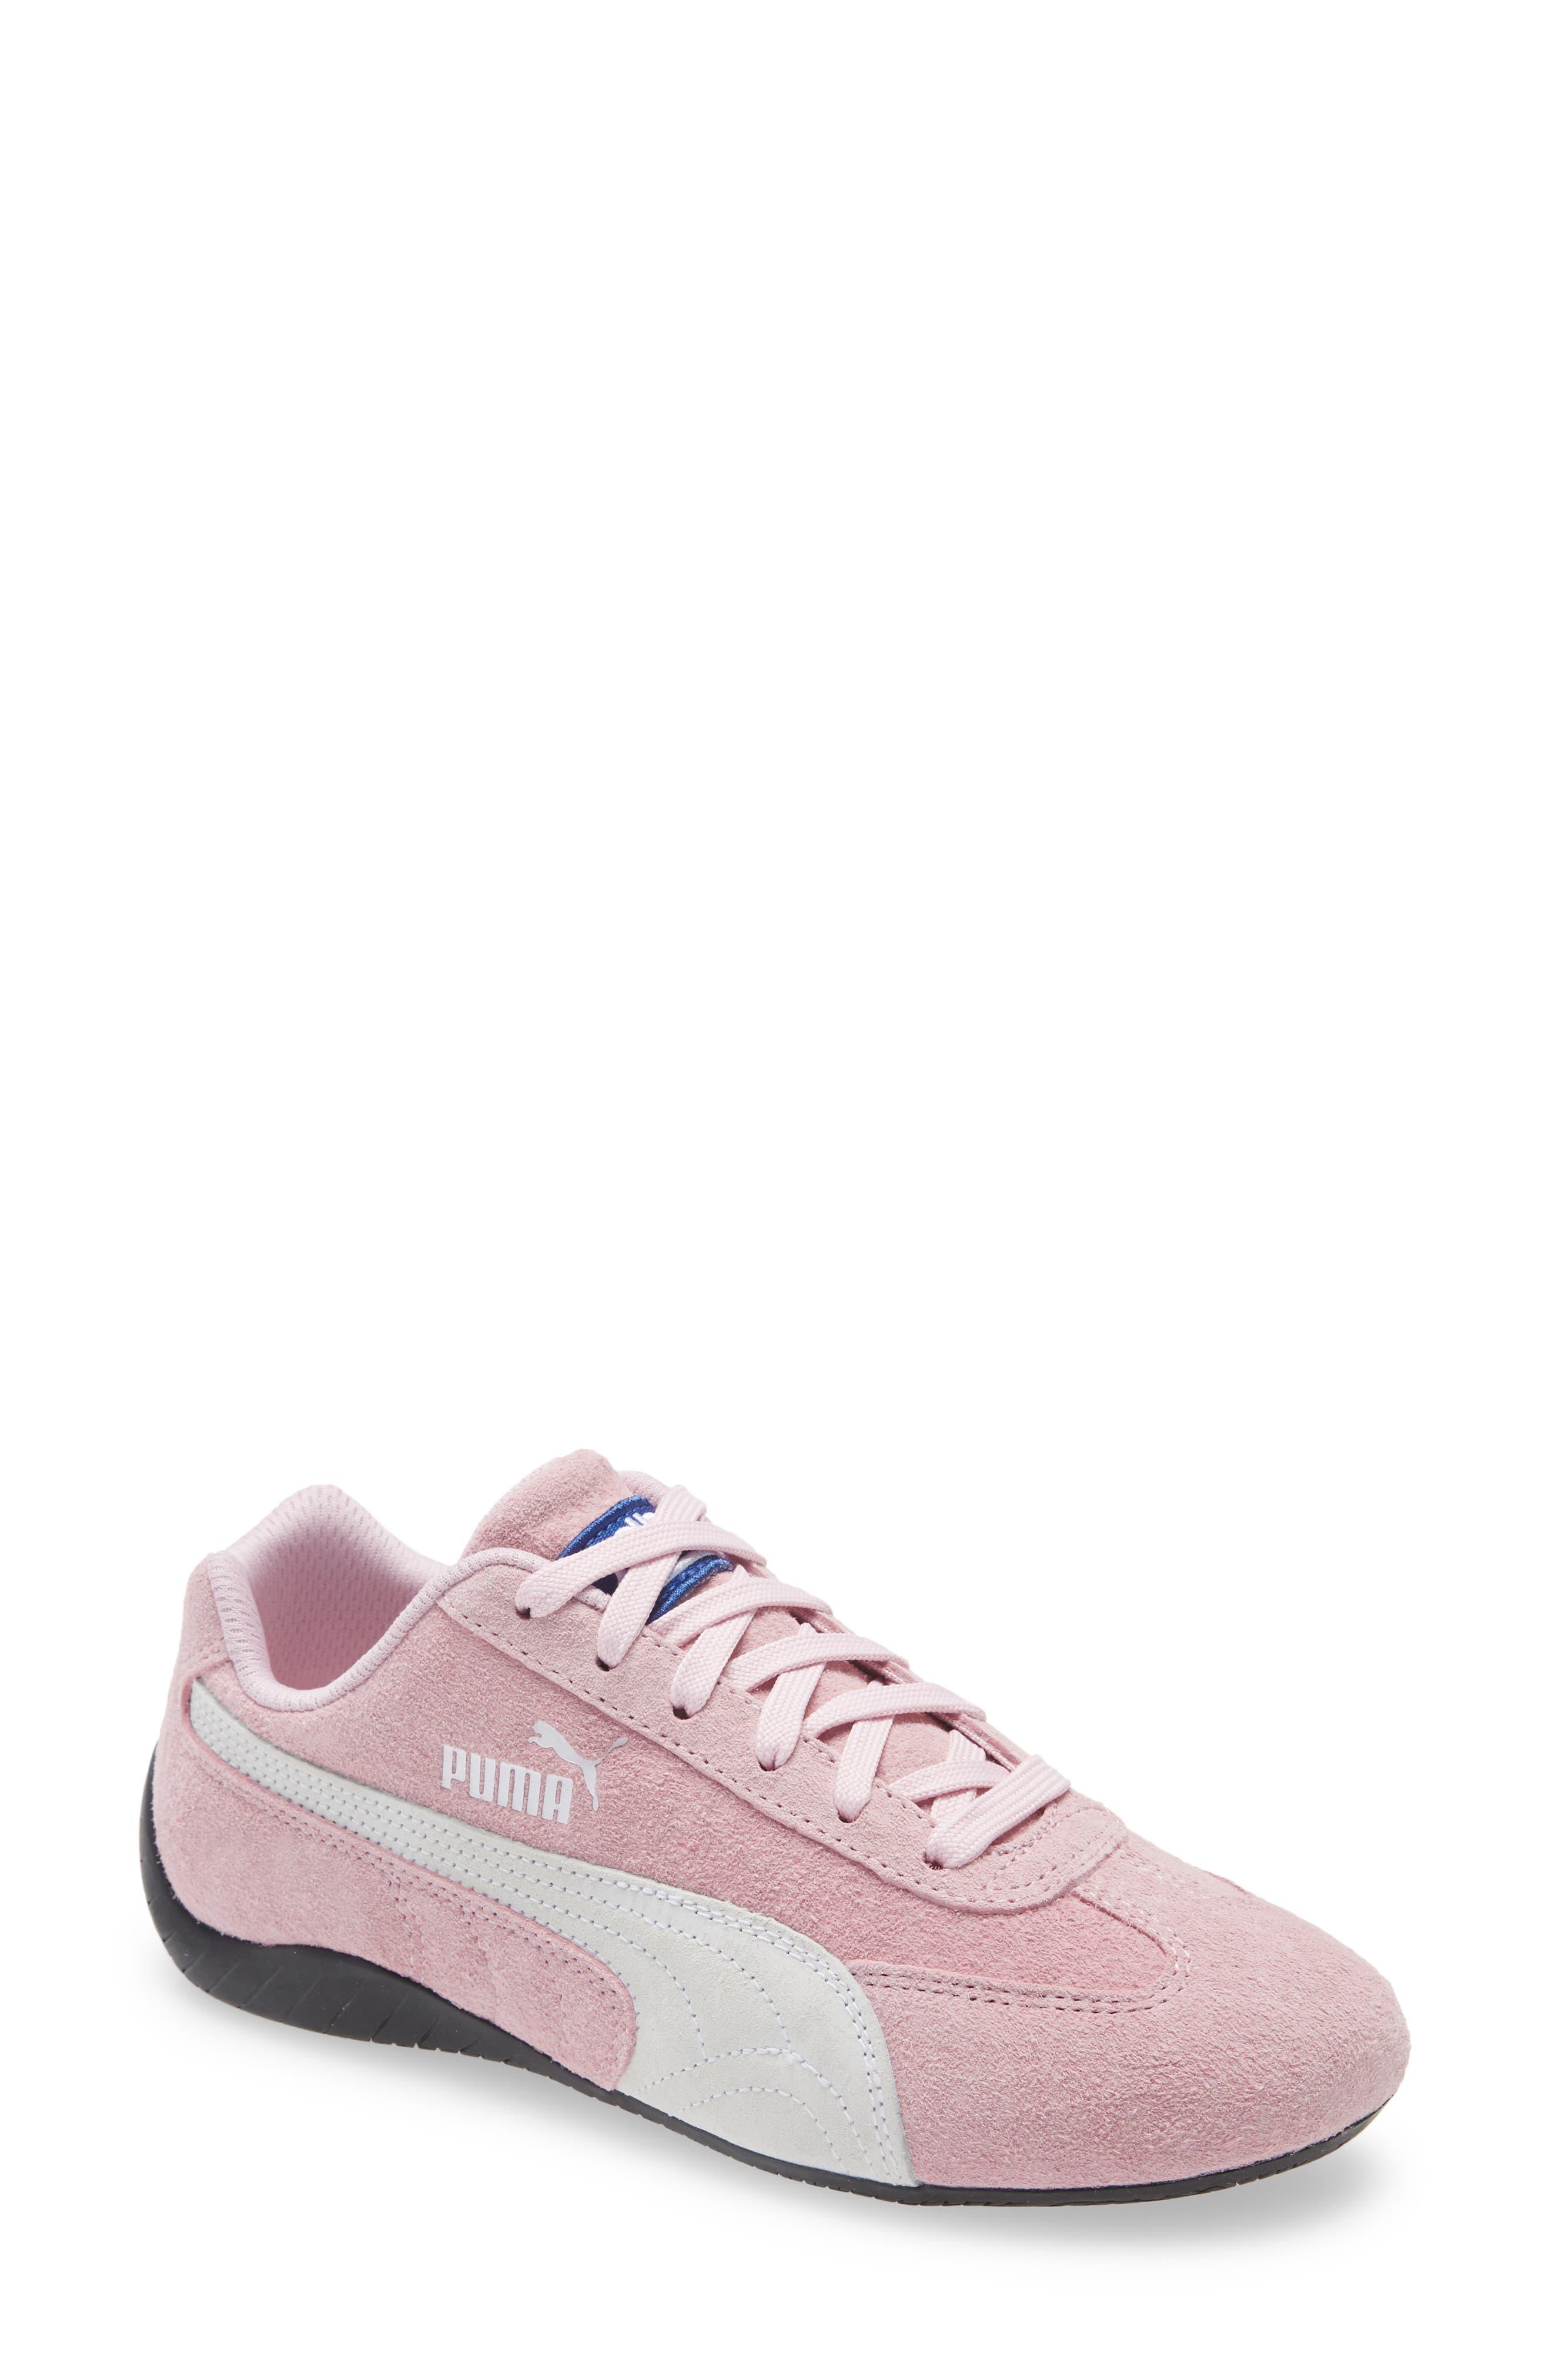 PUMA Sneakers \u0026 Athletic Shoes | Nordstrom